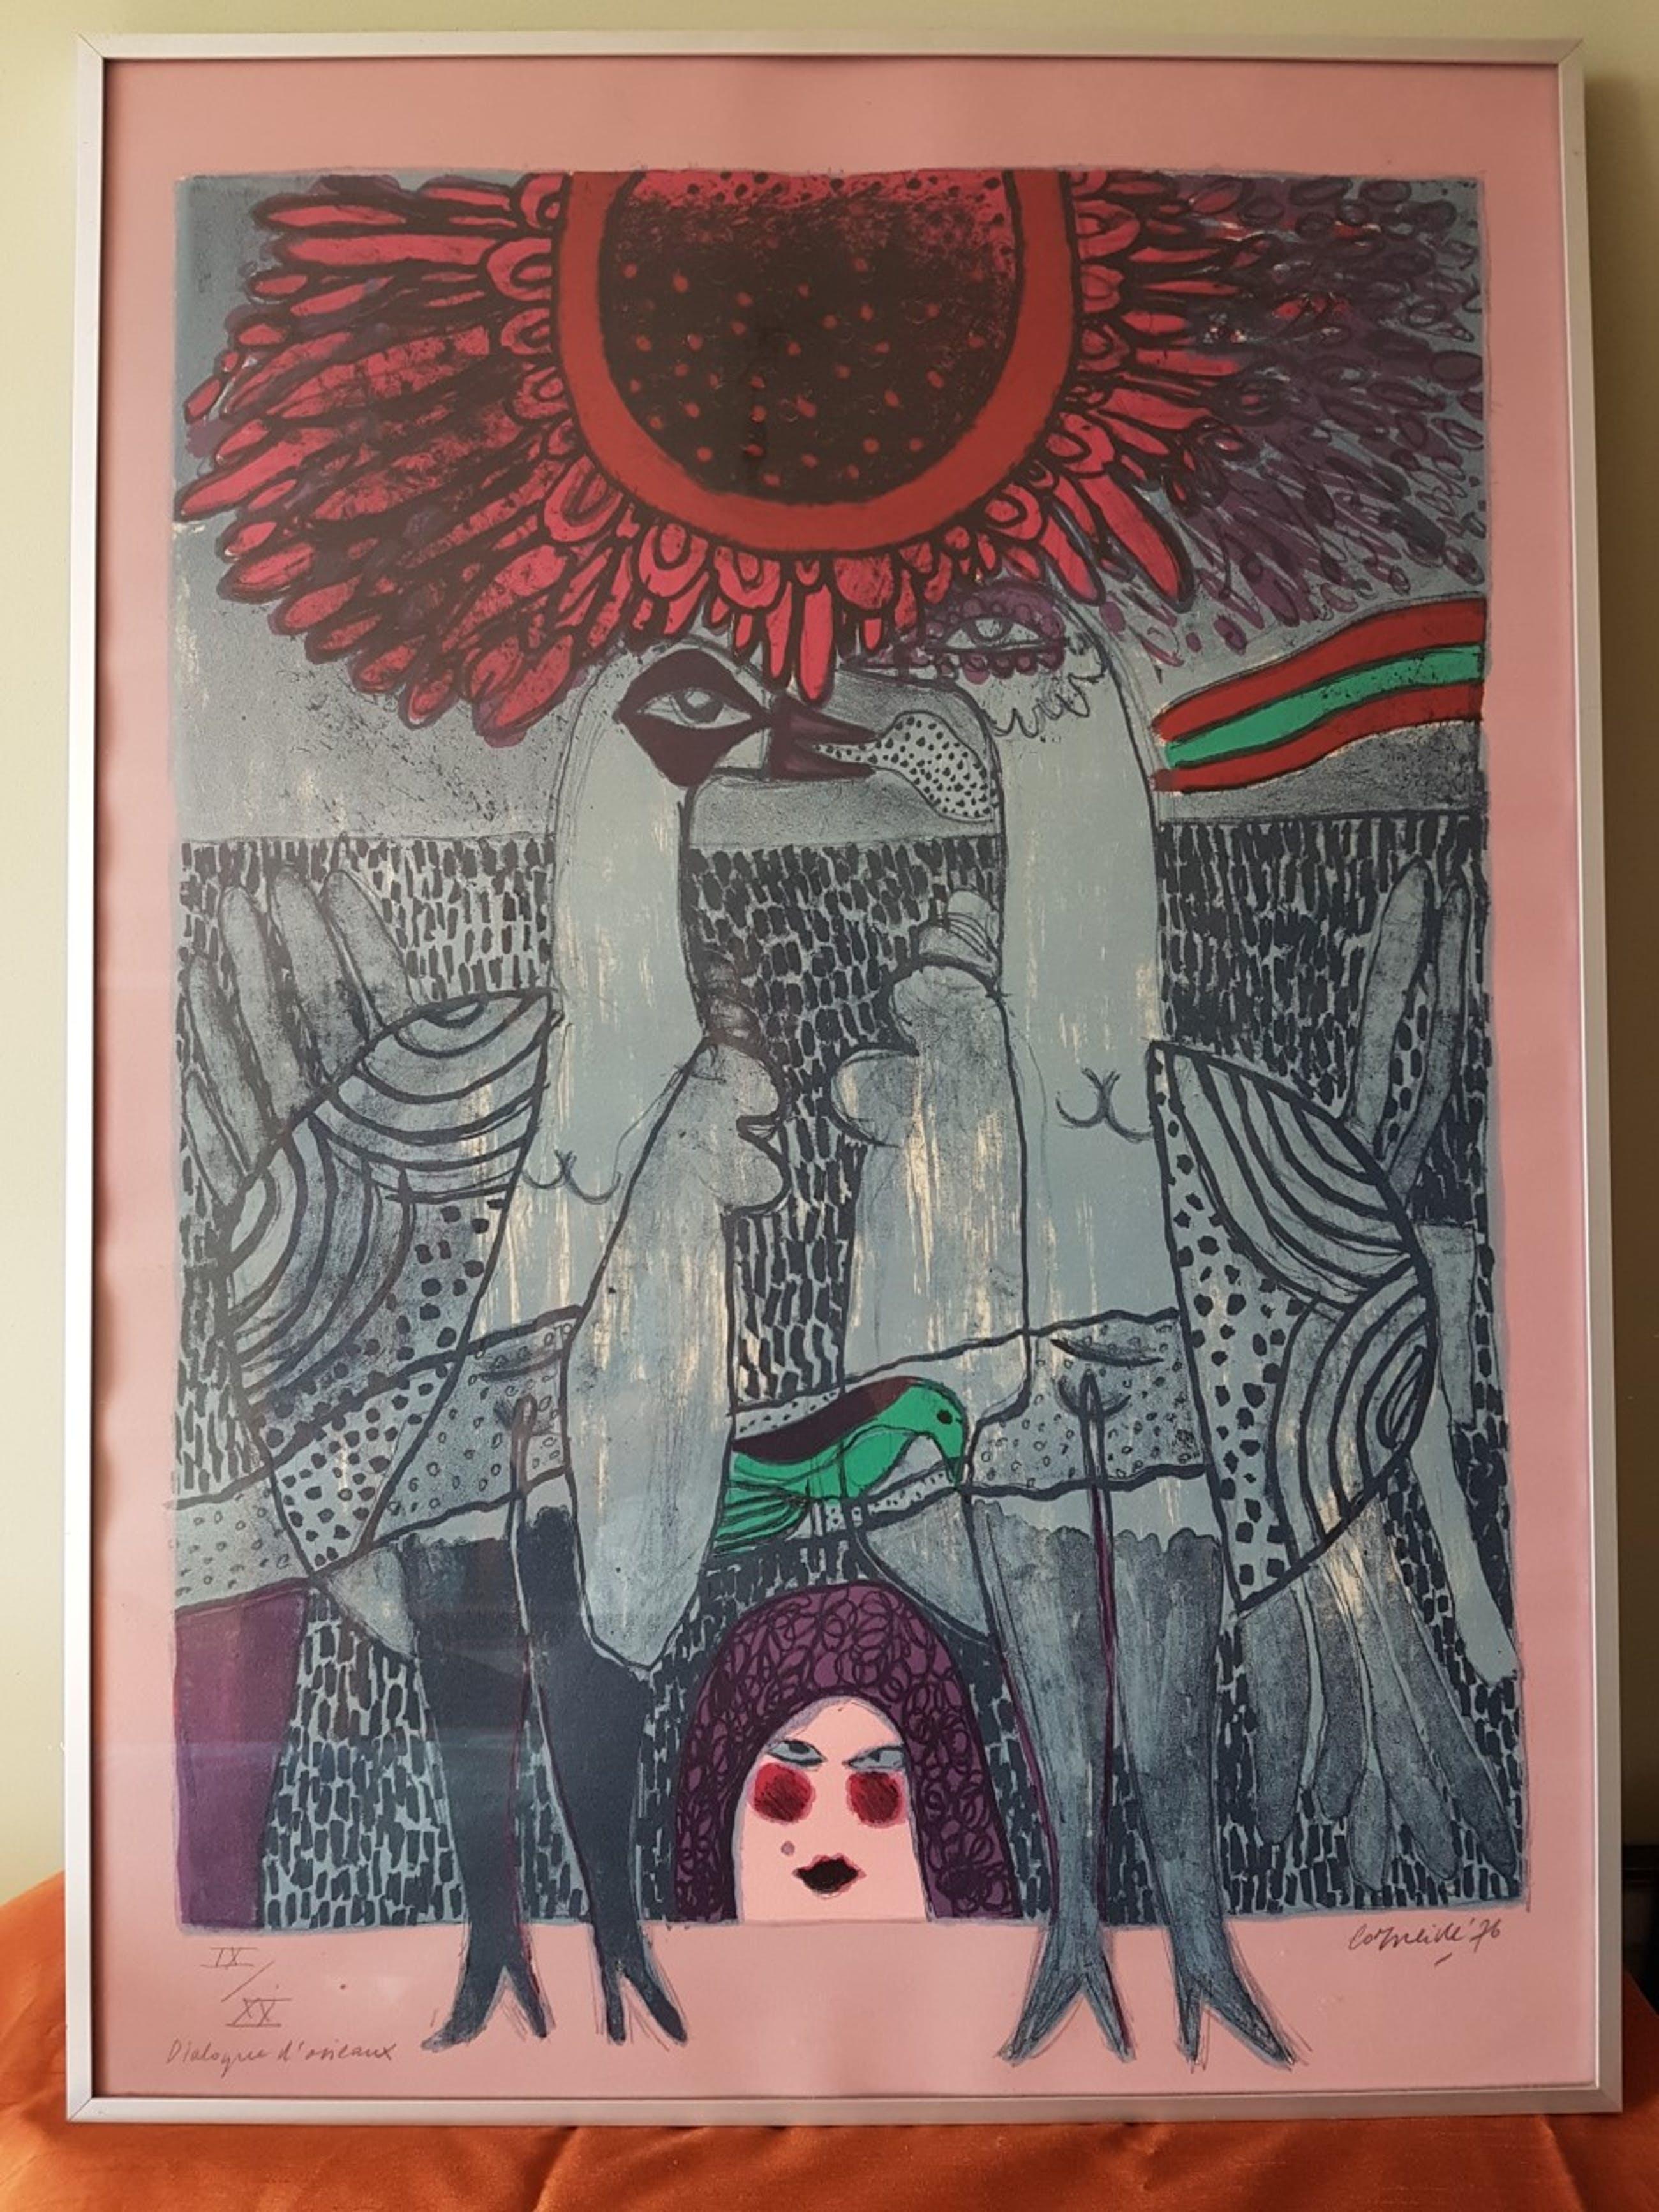 Corneille - 'Dialogue d'oiseaux' 1976 kopen? Bied vanaf 150!